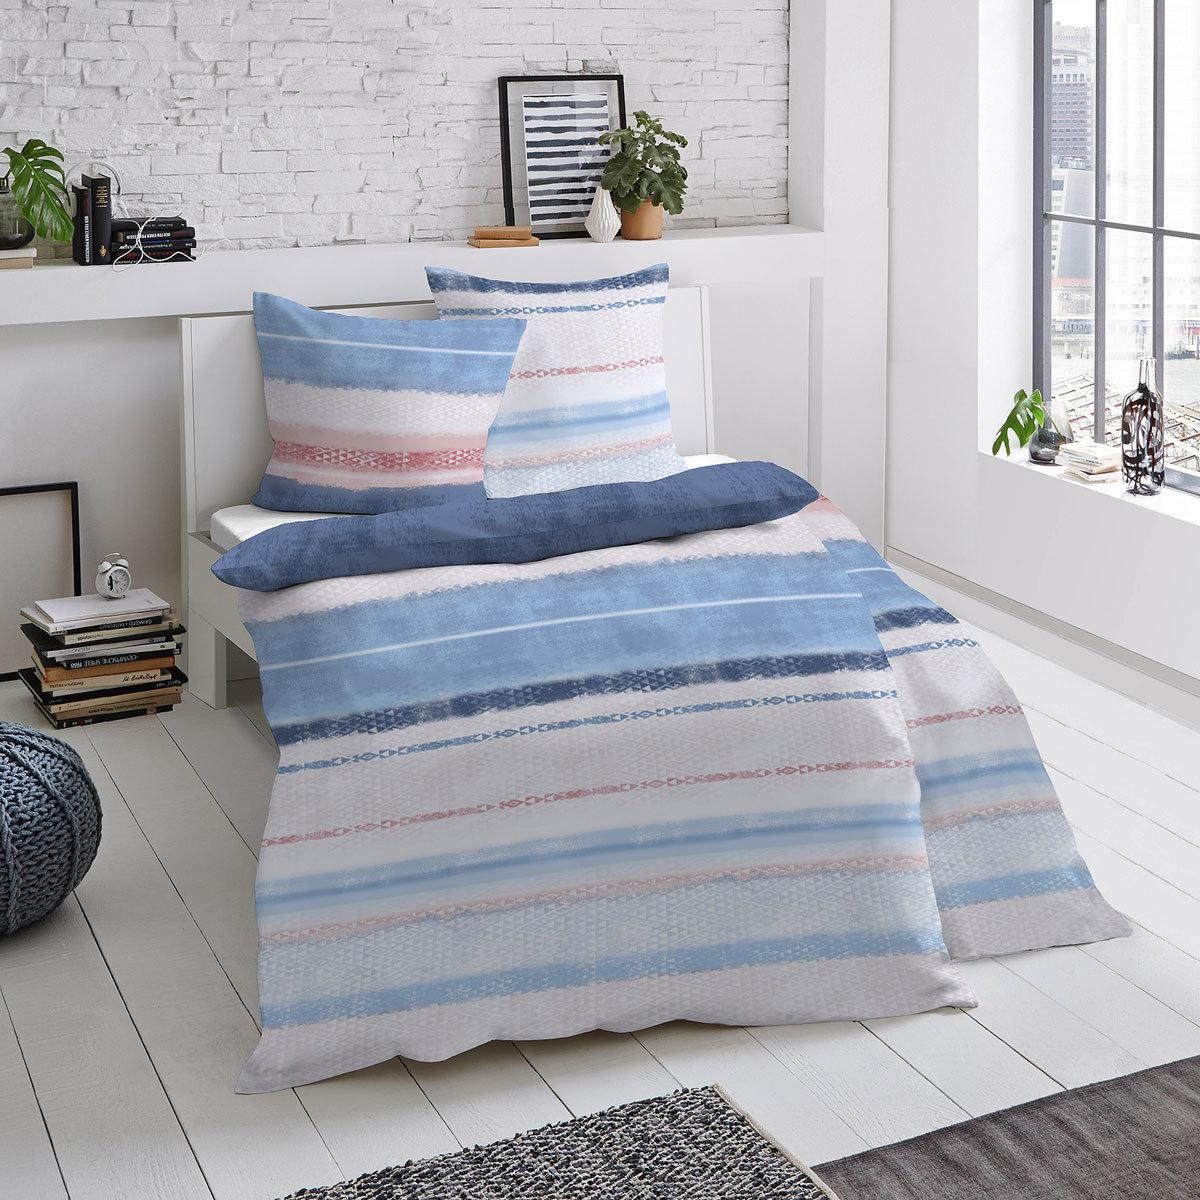 dormisette mako satin bettw sche montreal blau grau hausrobinson. Black Bedroom Furniture Sets. Home Design Ideas